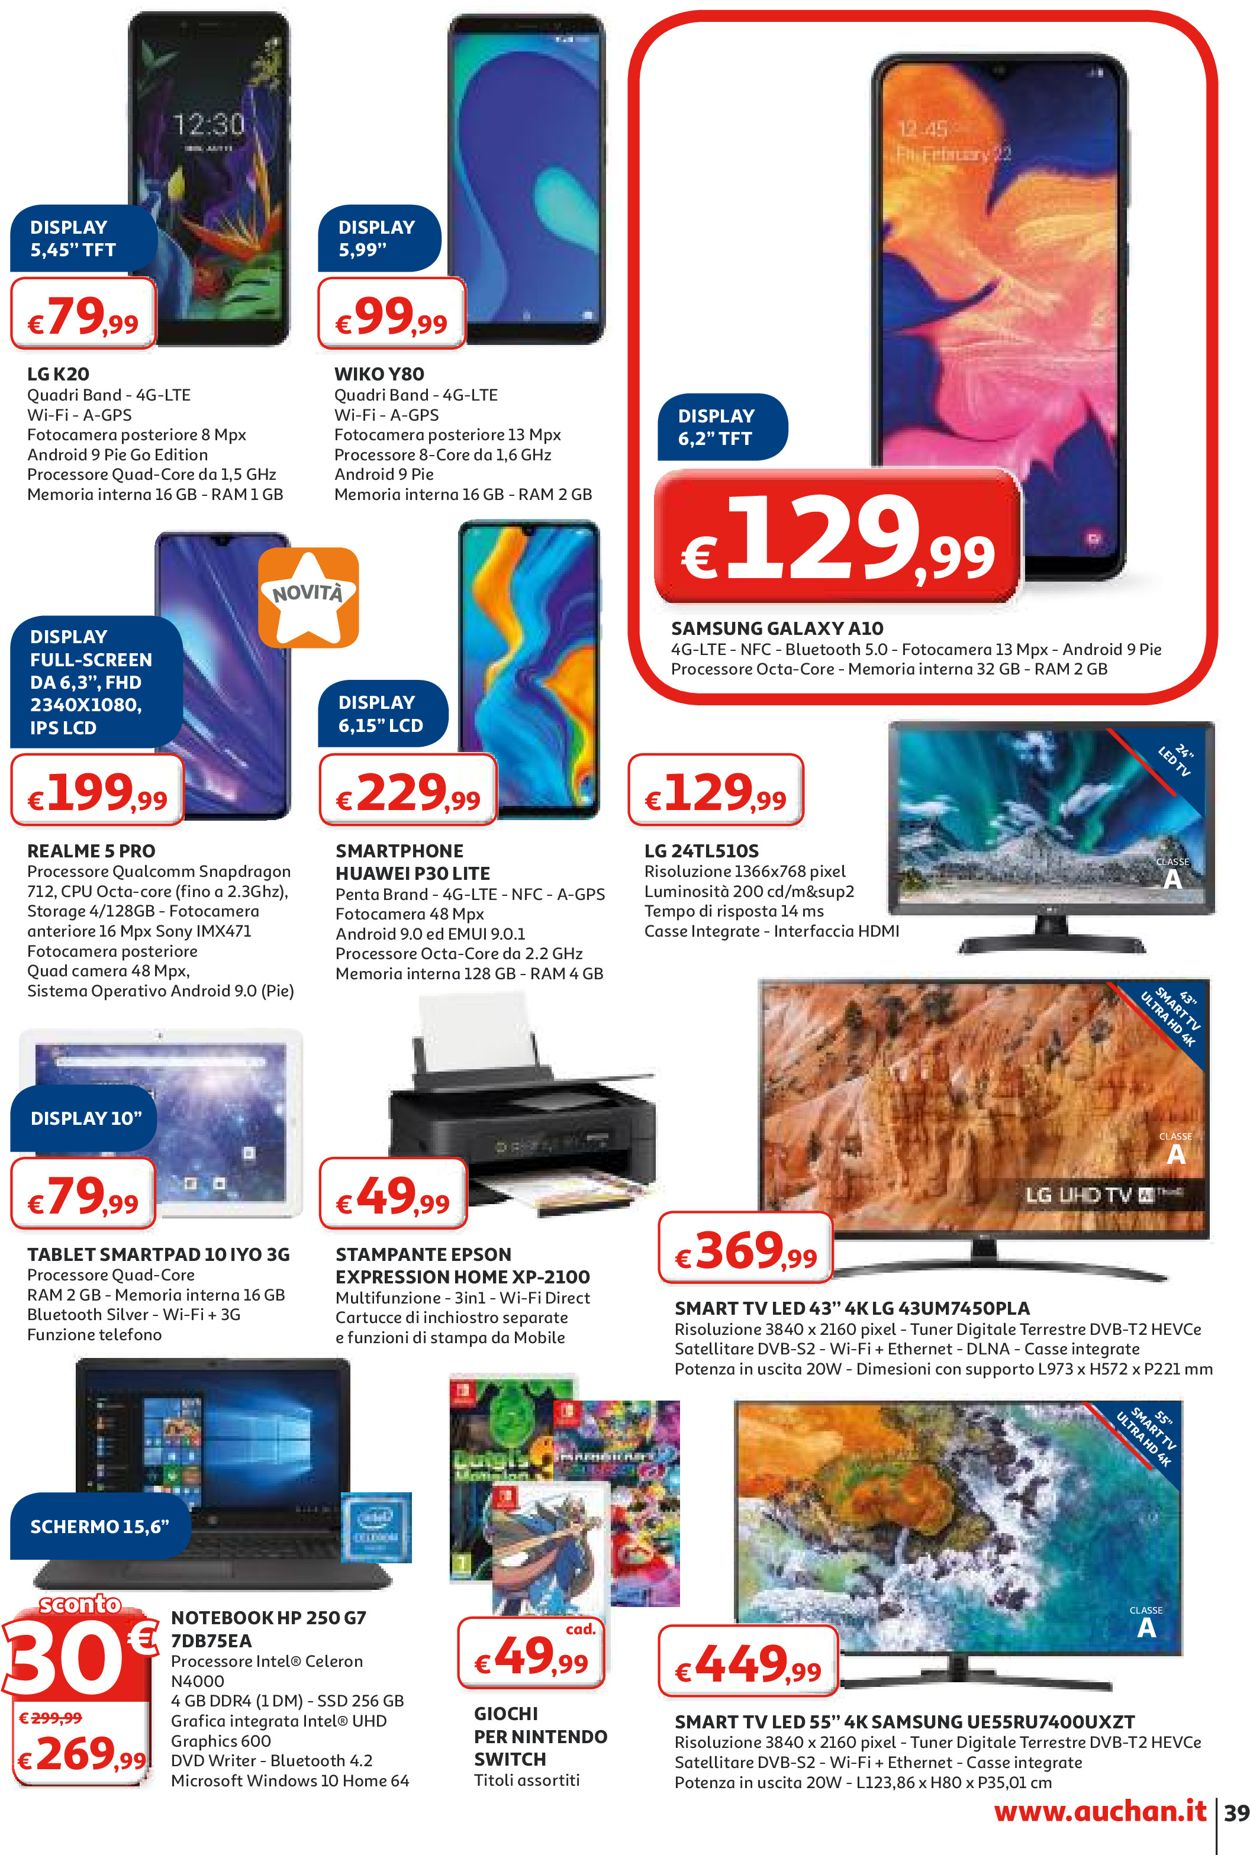 Volantino Auchan - Offerte 27/02-08/03/2020 (Pagina 39)